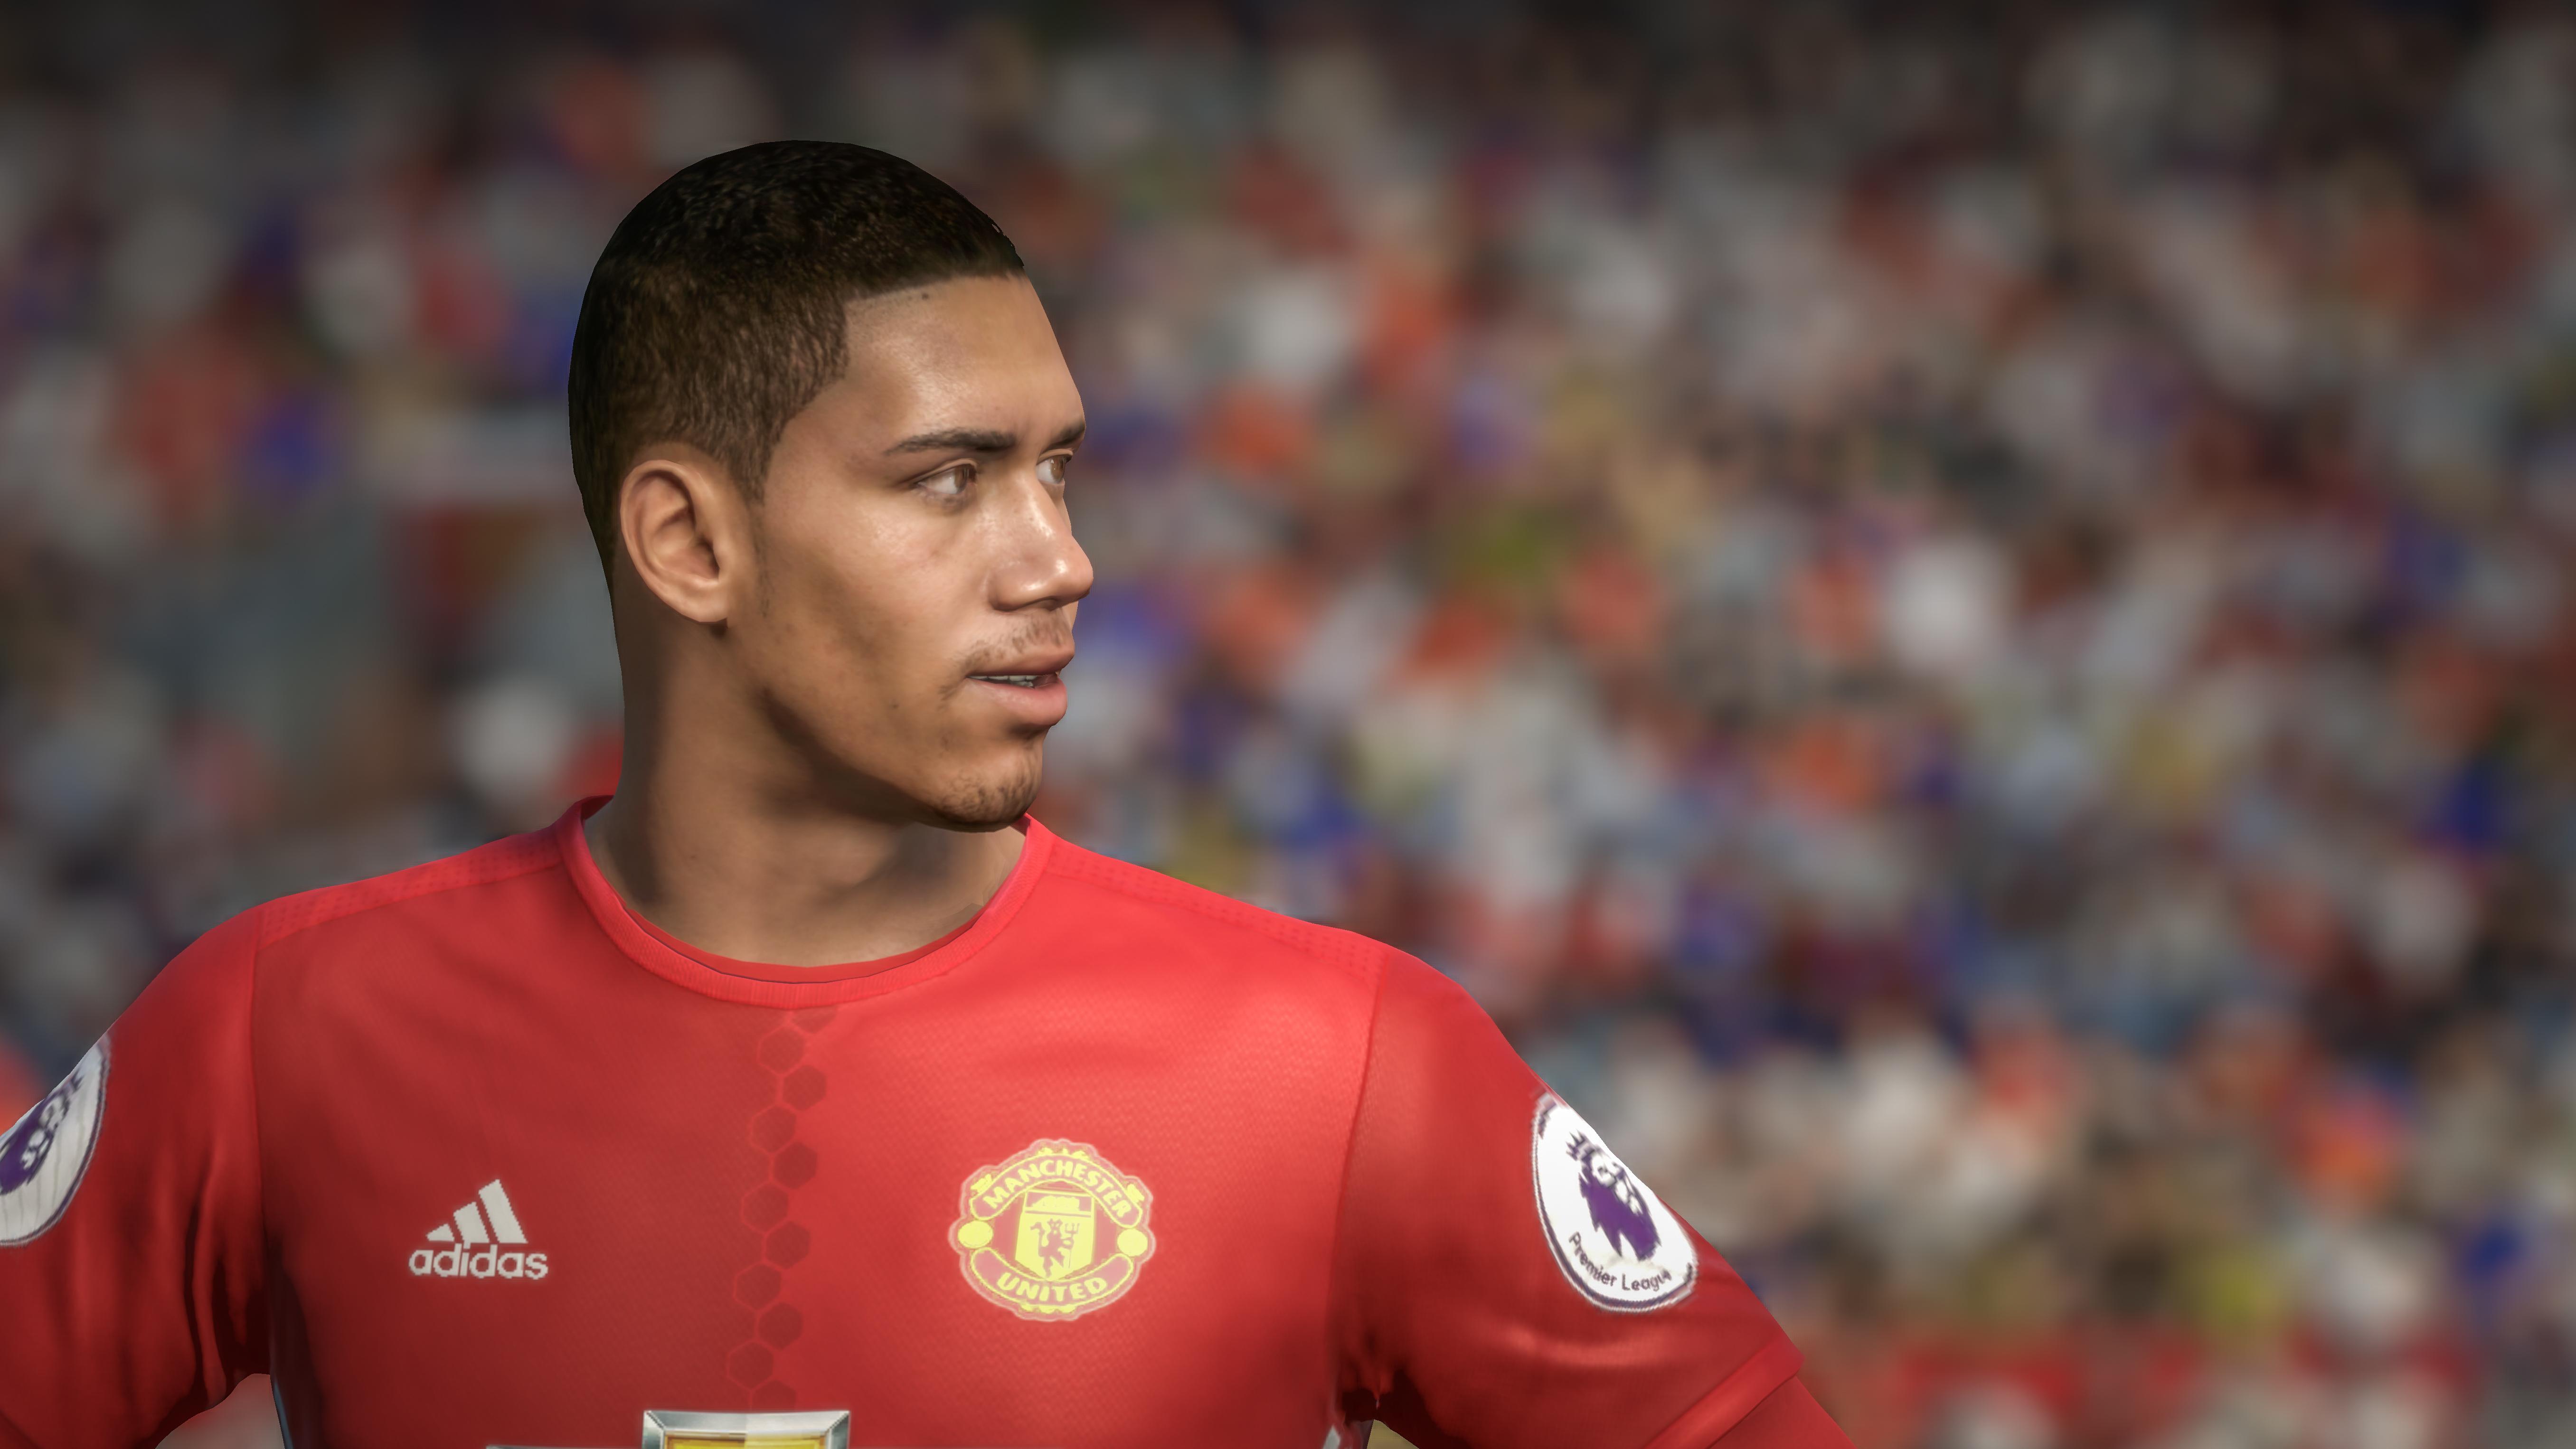 Chris Smalling FIFA 17